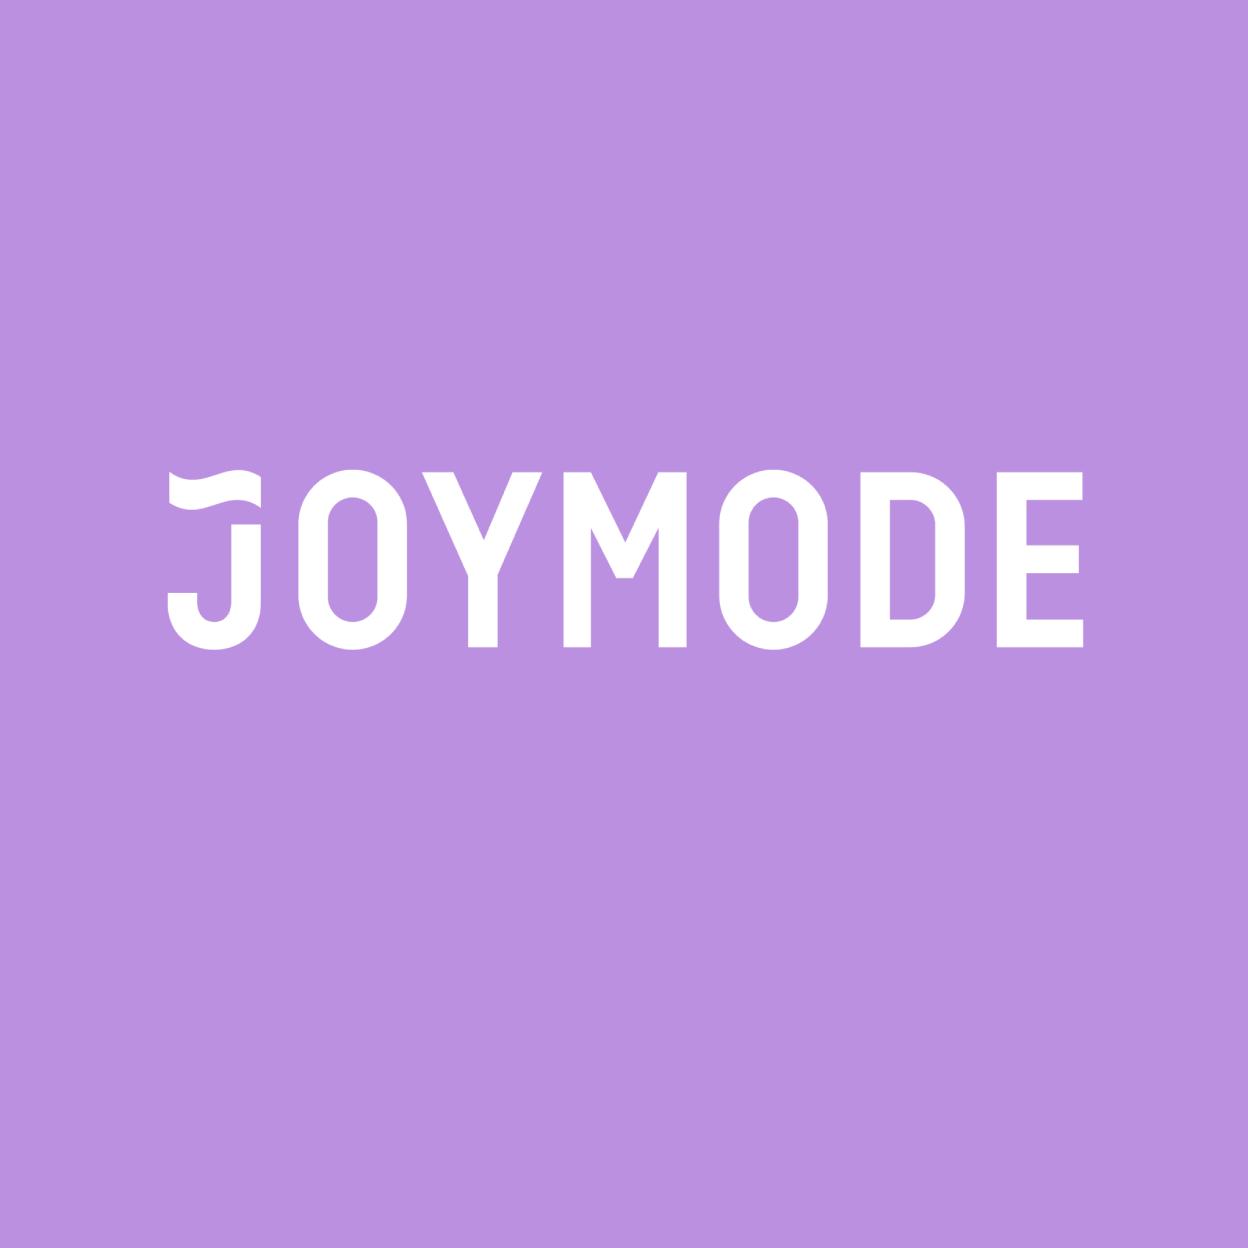 Joe Fernandez - CO-FOUNDER, JOYMODEFORMER FOUNDER, KLOUT.COM (SOLD FOR $200M)